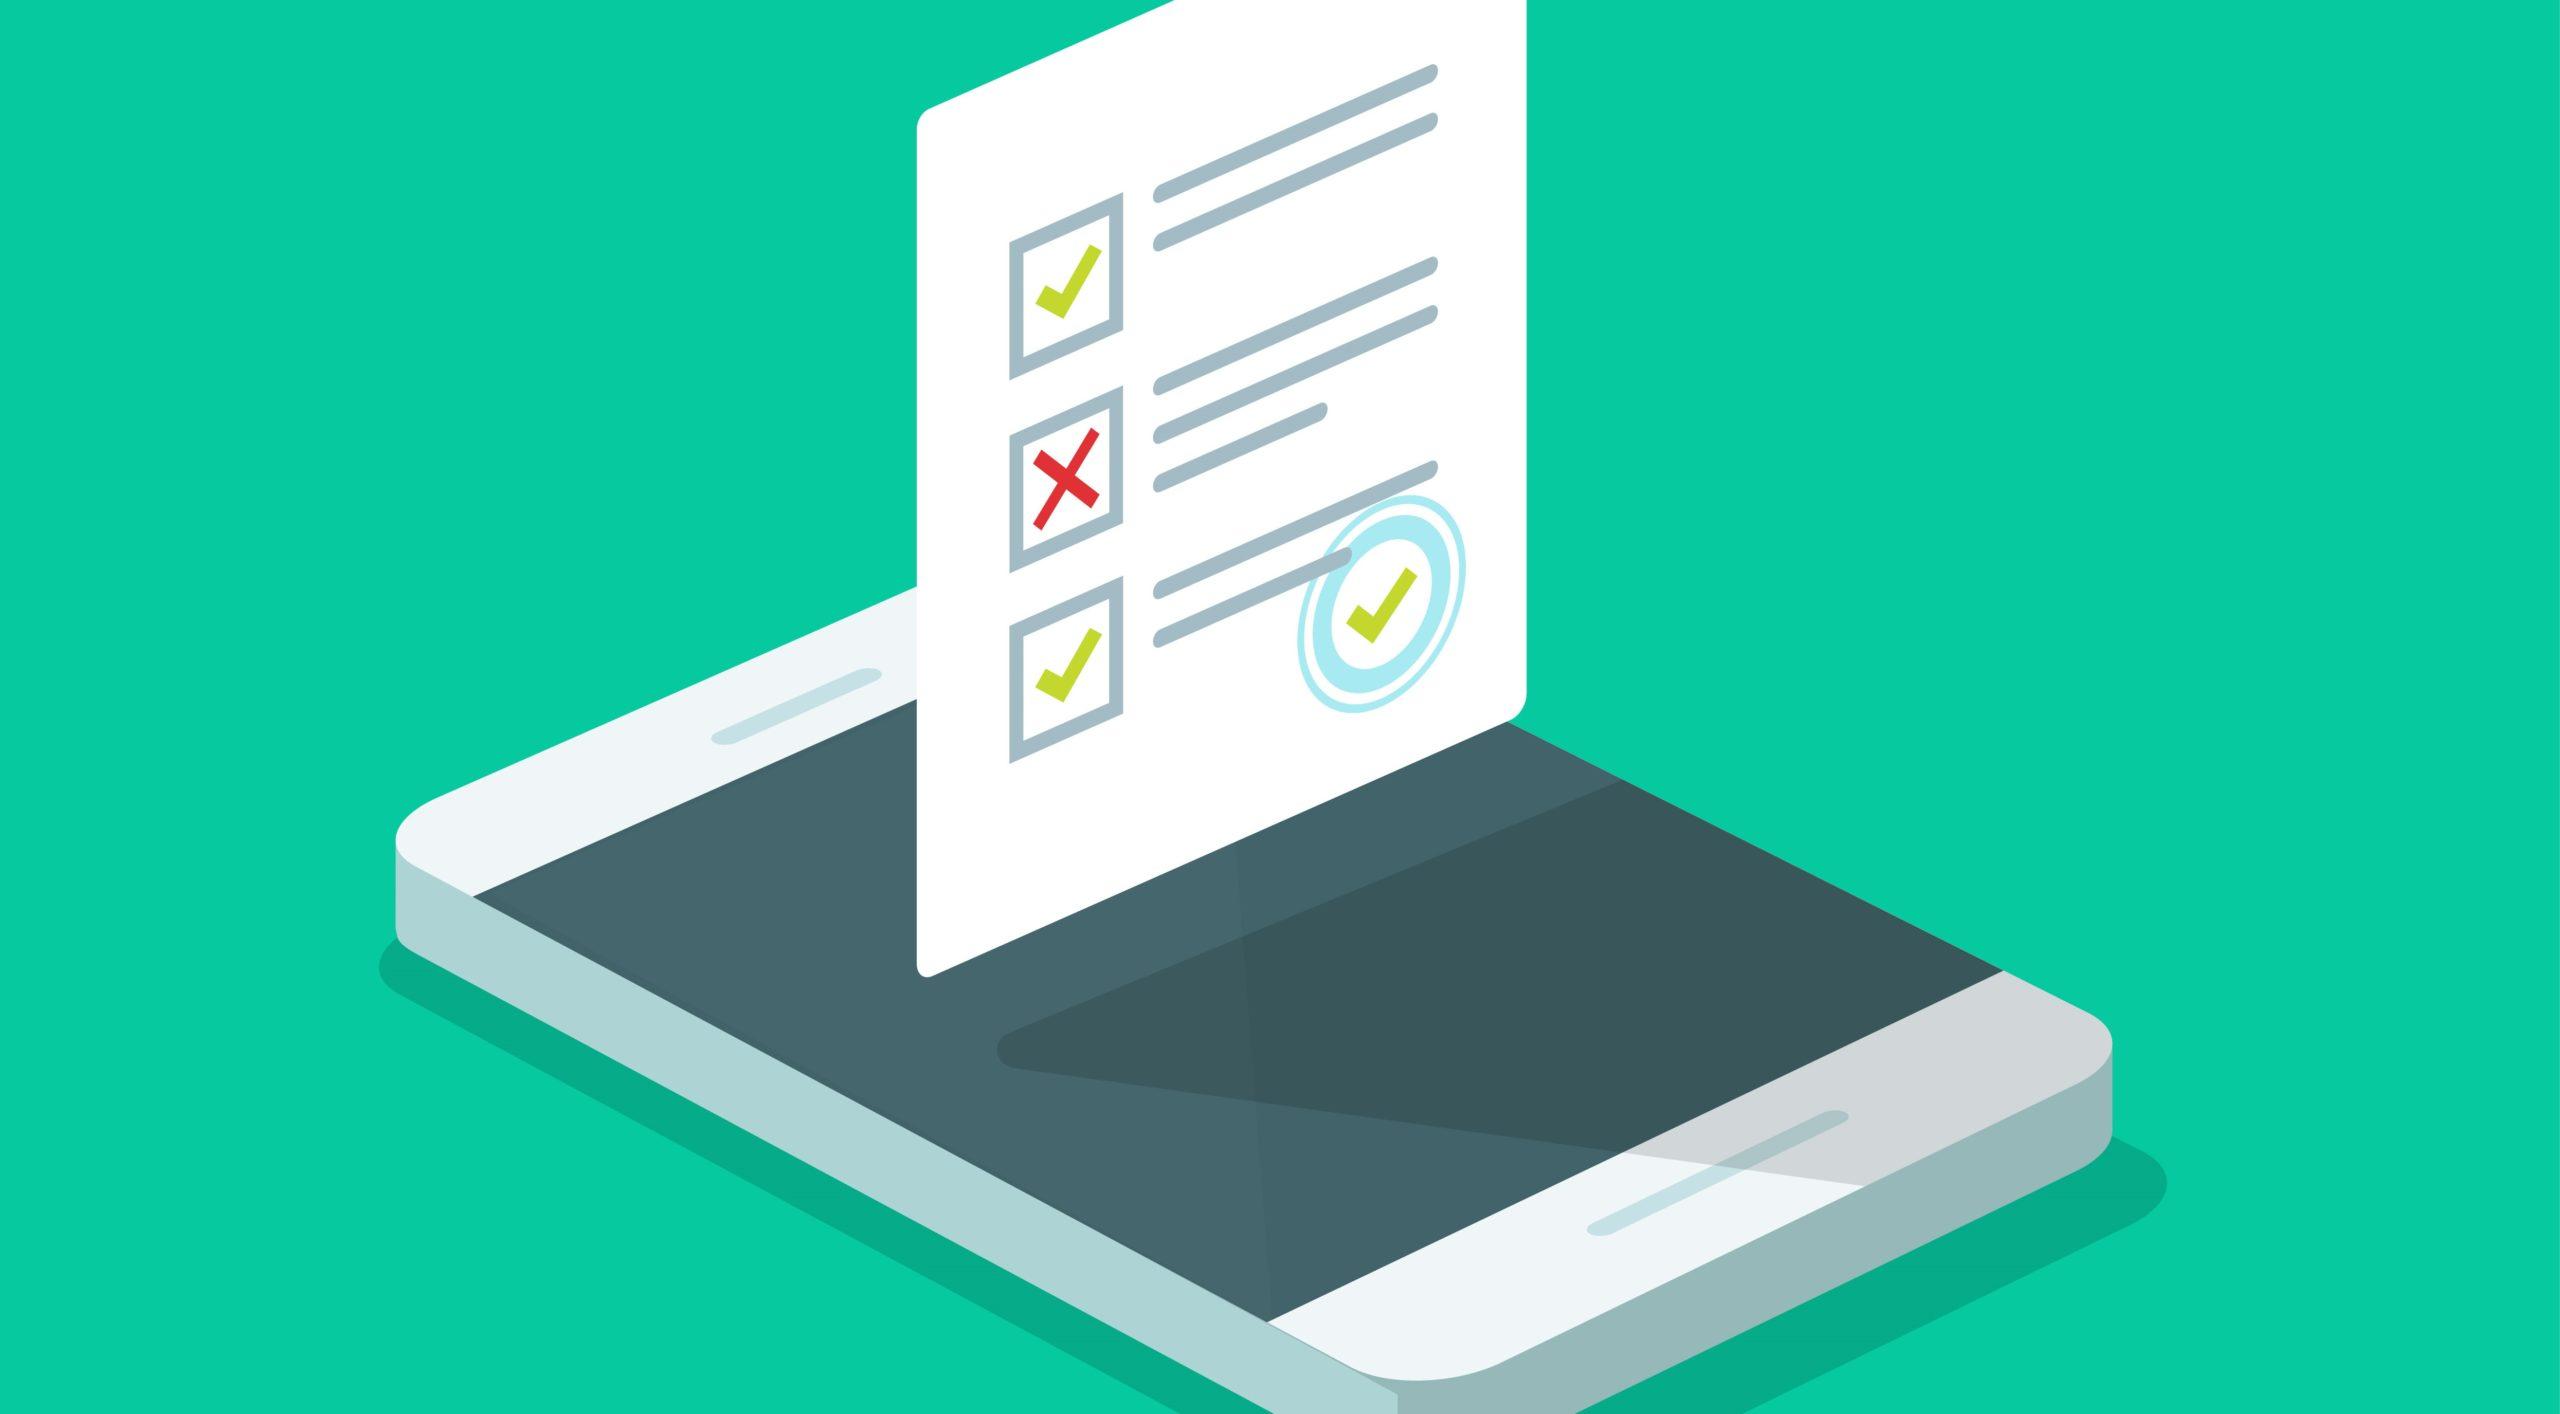 customer testimonial request form on website on smartphone display